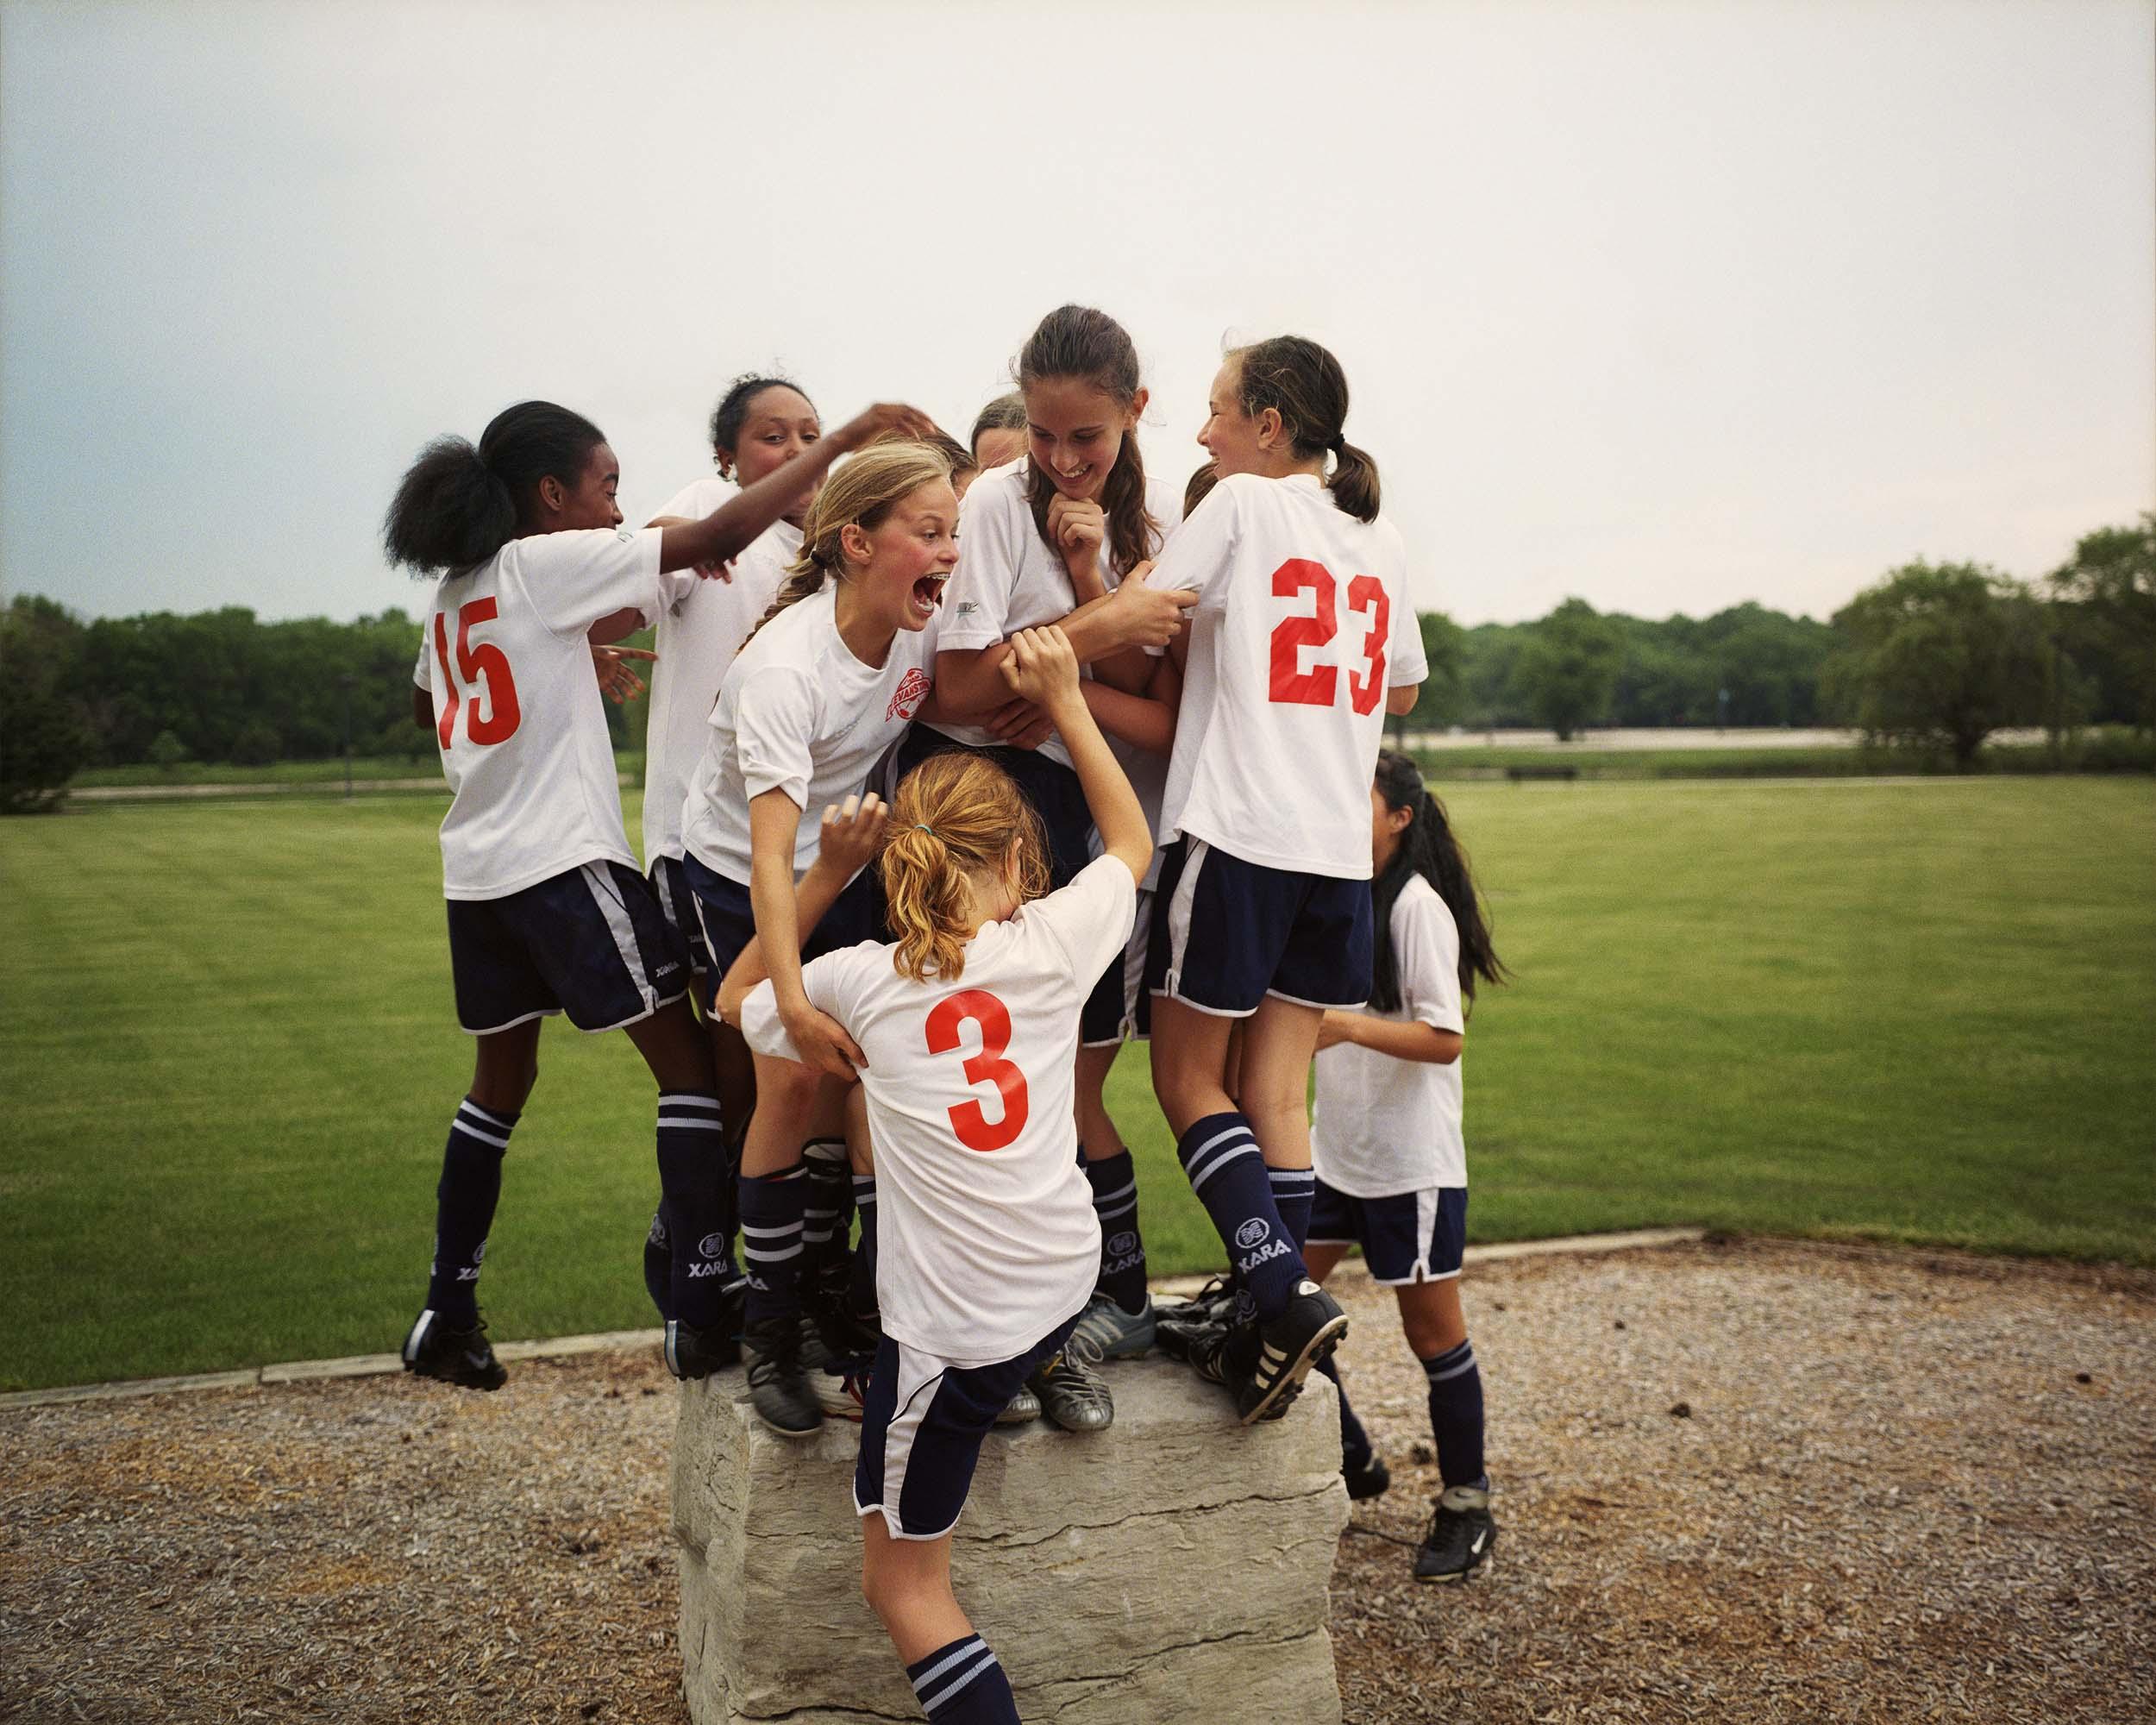 Team, Evanston - 2006, © Melissa Ann Pinney